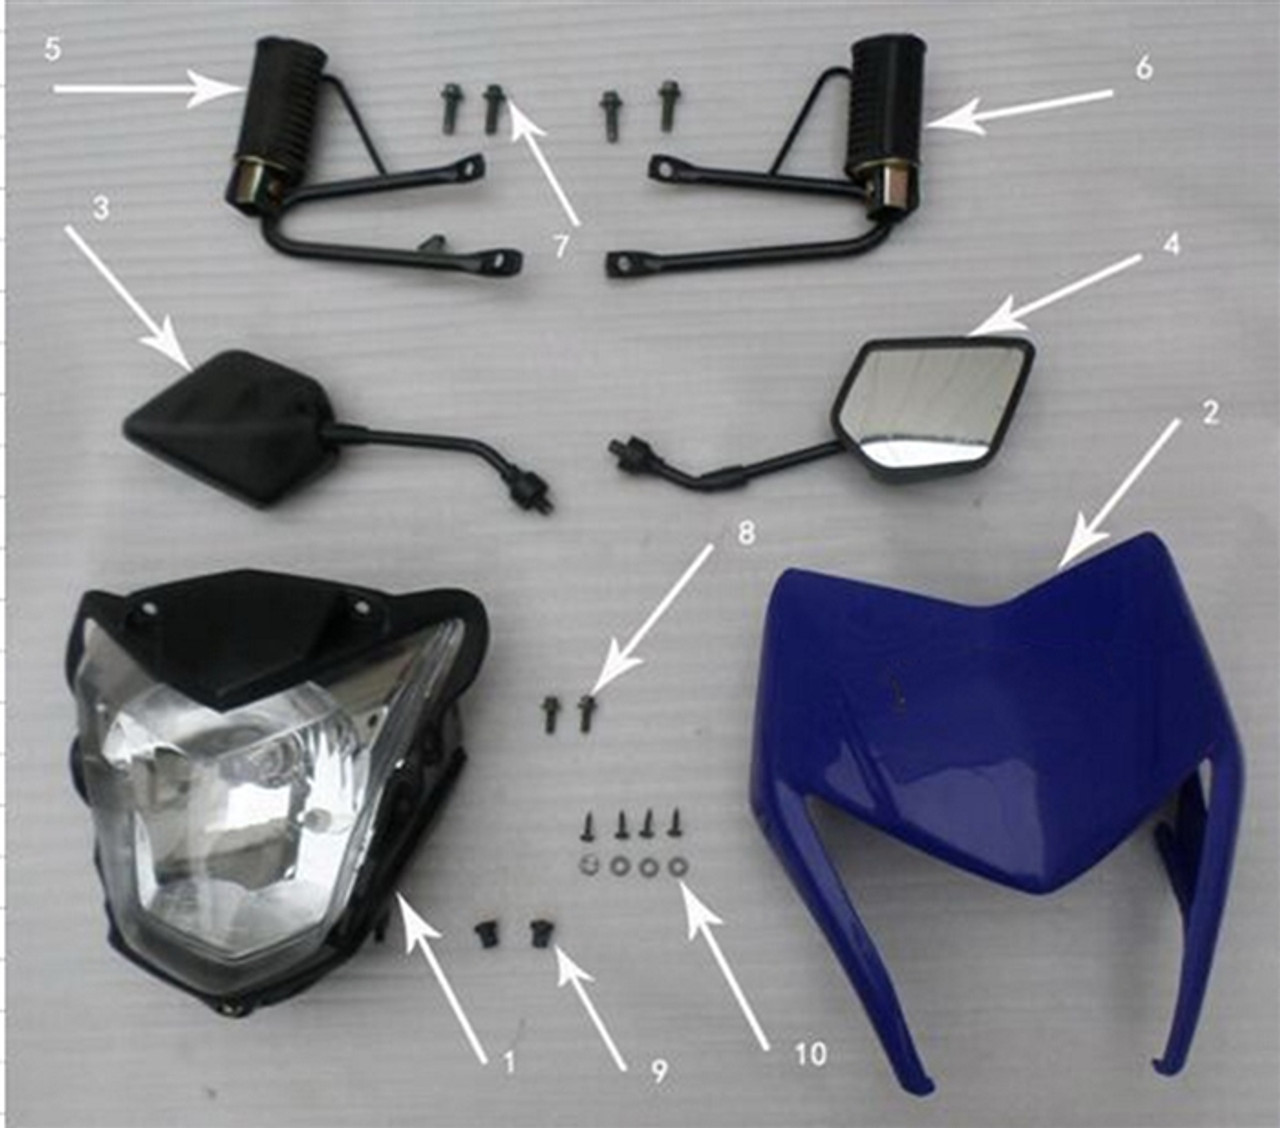 Hawk 250 Head light cover